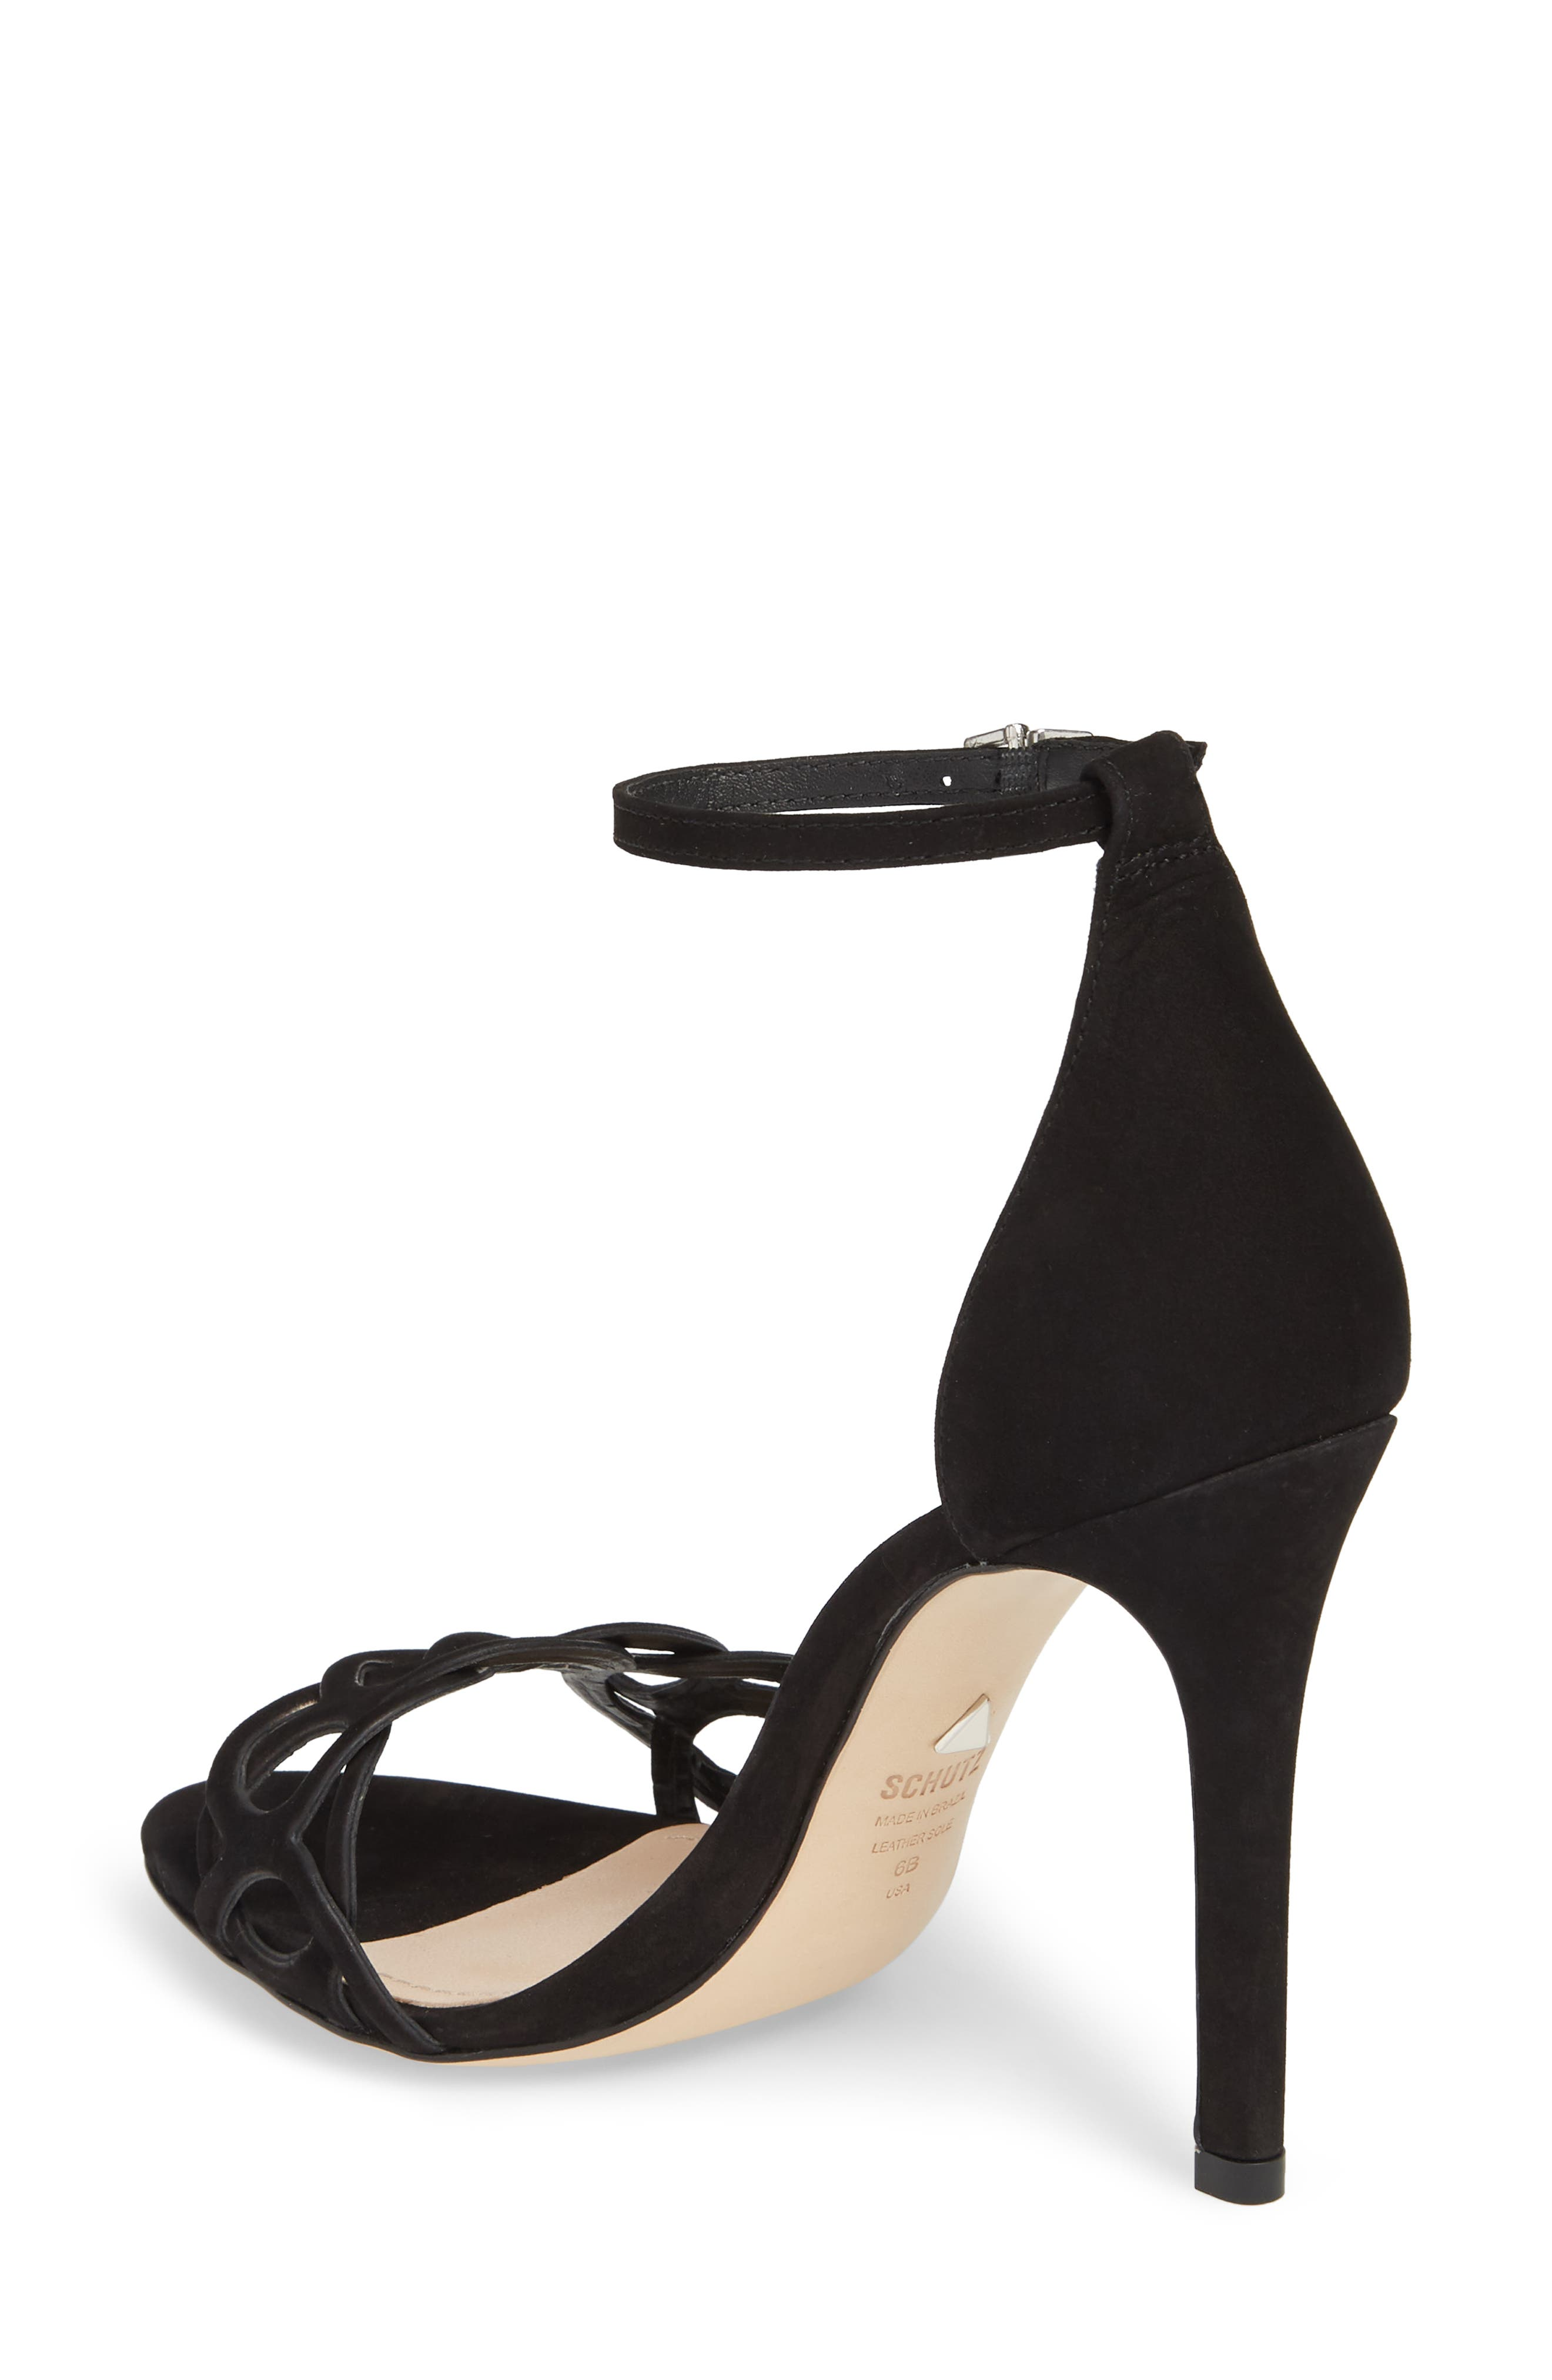 Sthefany Ankle Strap Sandal,                             Alternate thumbnail 2, color,                             BLACK LEATHER